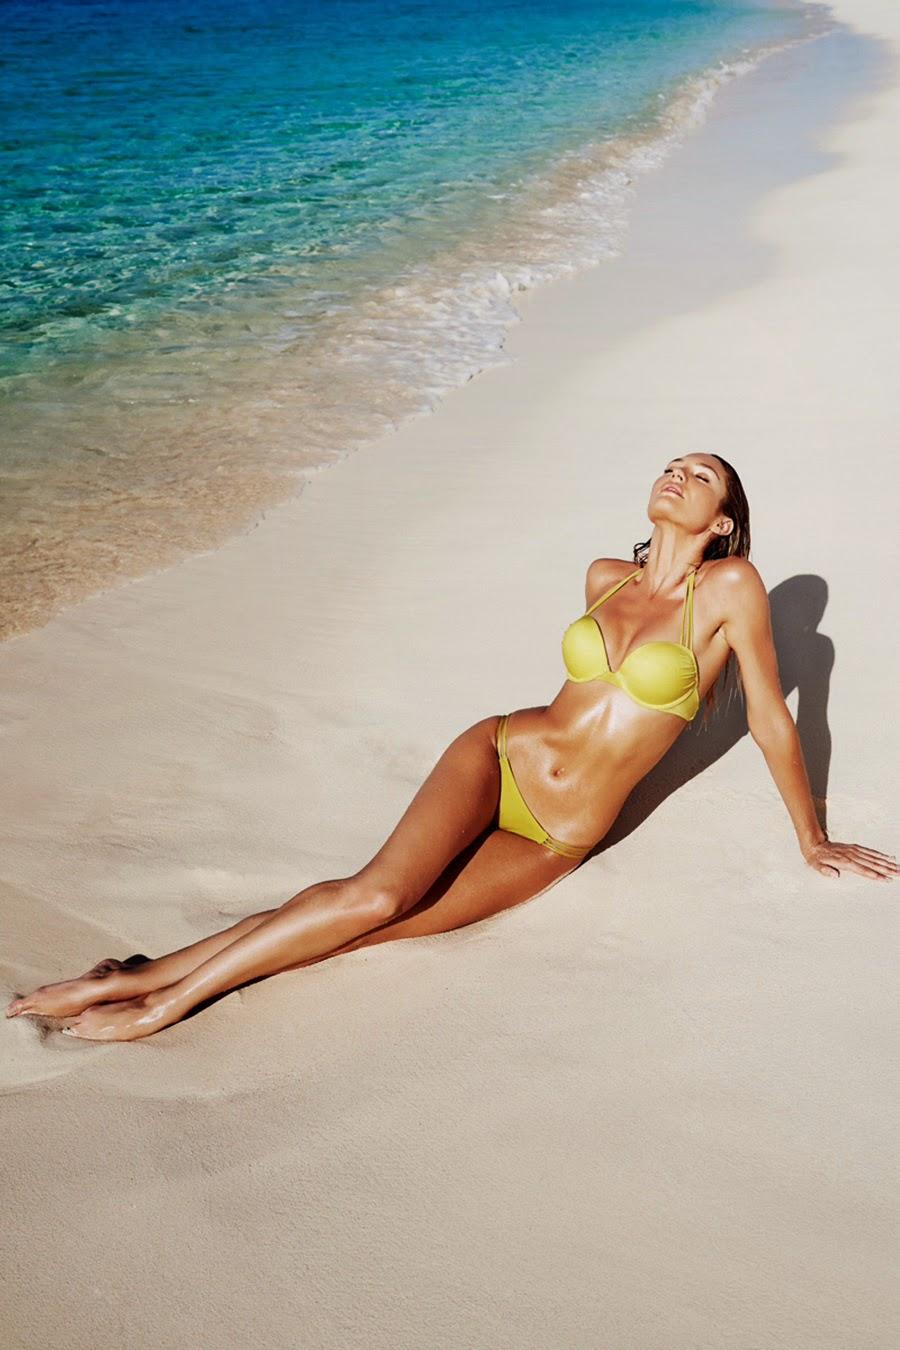 Candice-Swanepoel-Paola-Murray-Swimwear-10.jpg